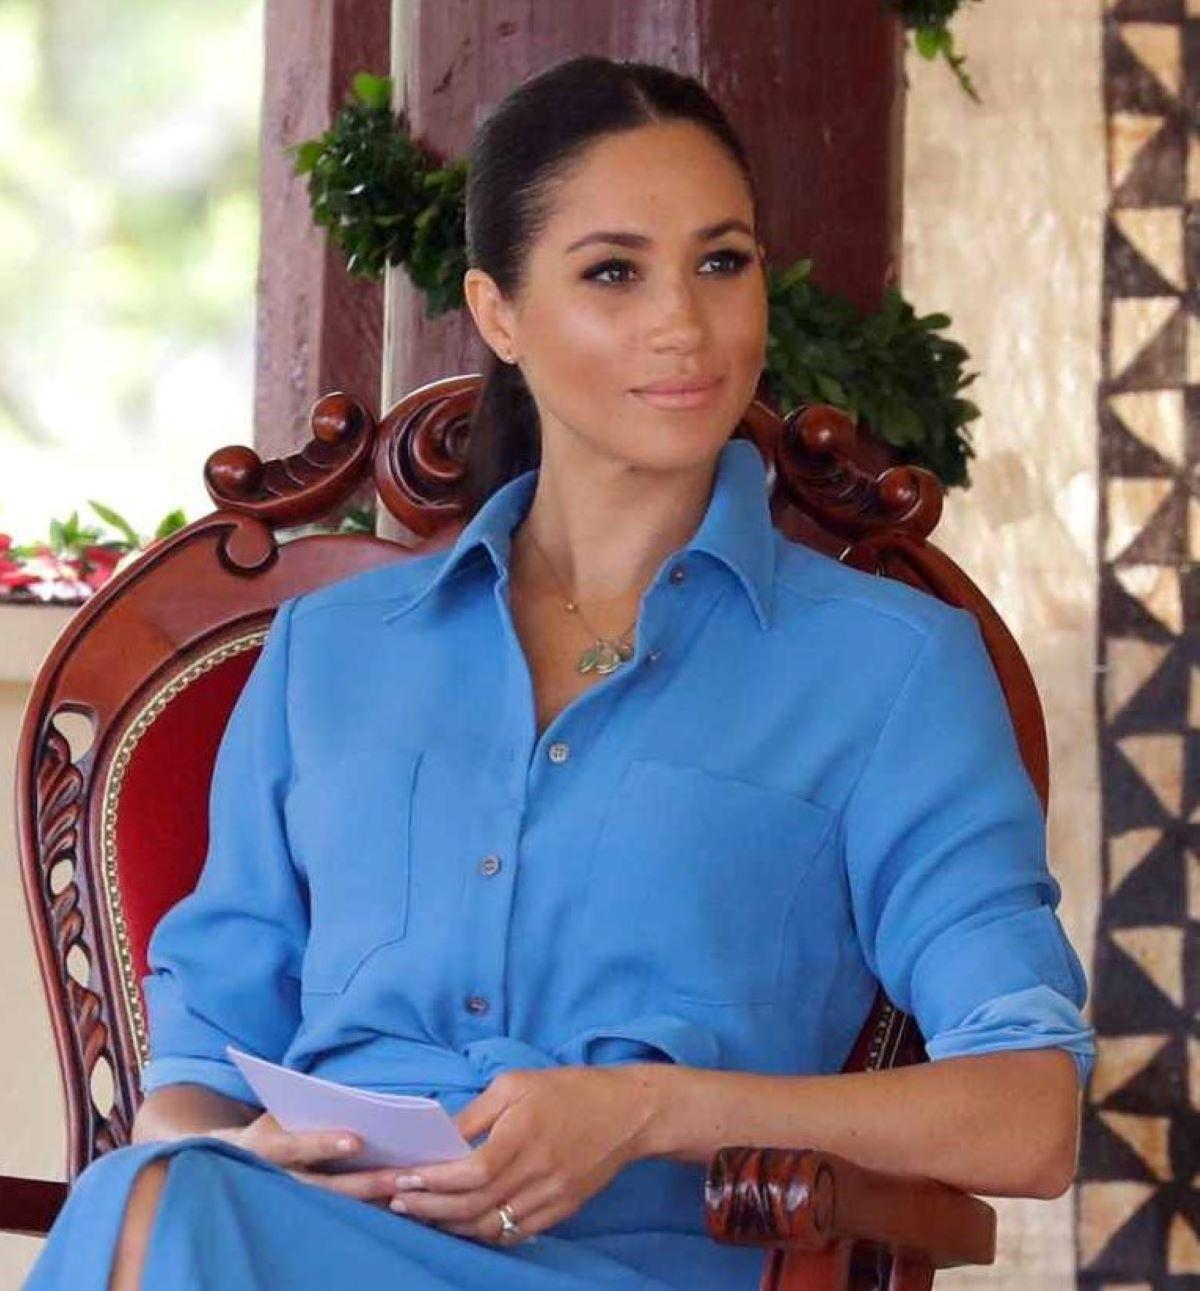 Meghan Markle Compleanno 40 anni Gesto Kate Middleton Principe William